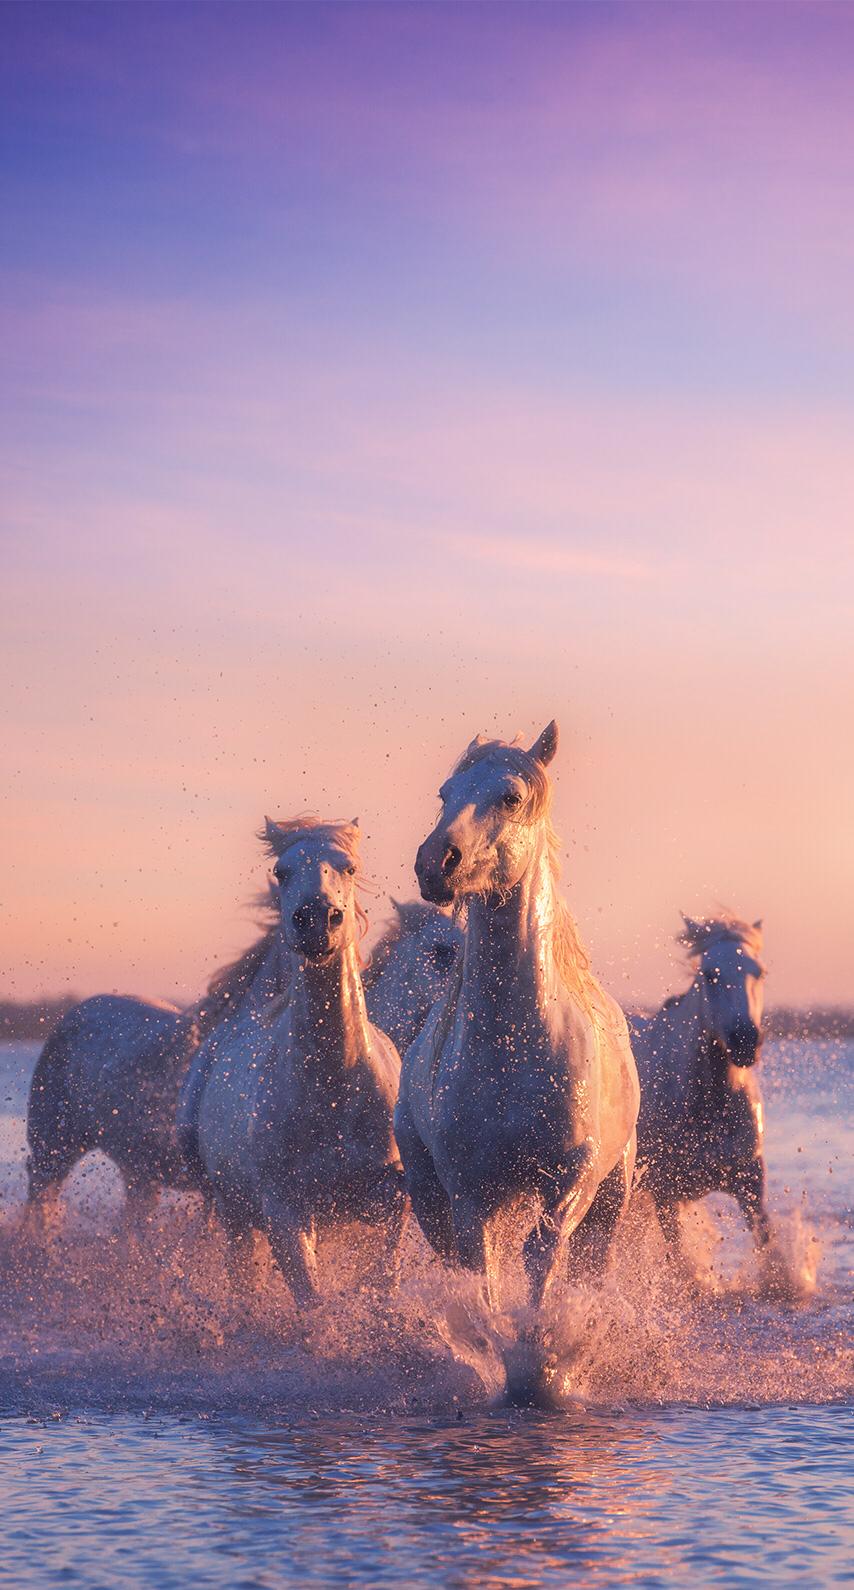 Pin De Ghaida Em Iphone Wallpaper Cavalo Wallpaper Cavalos Cavalos Bonitos